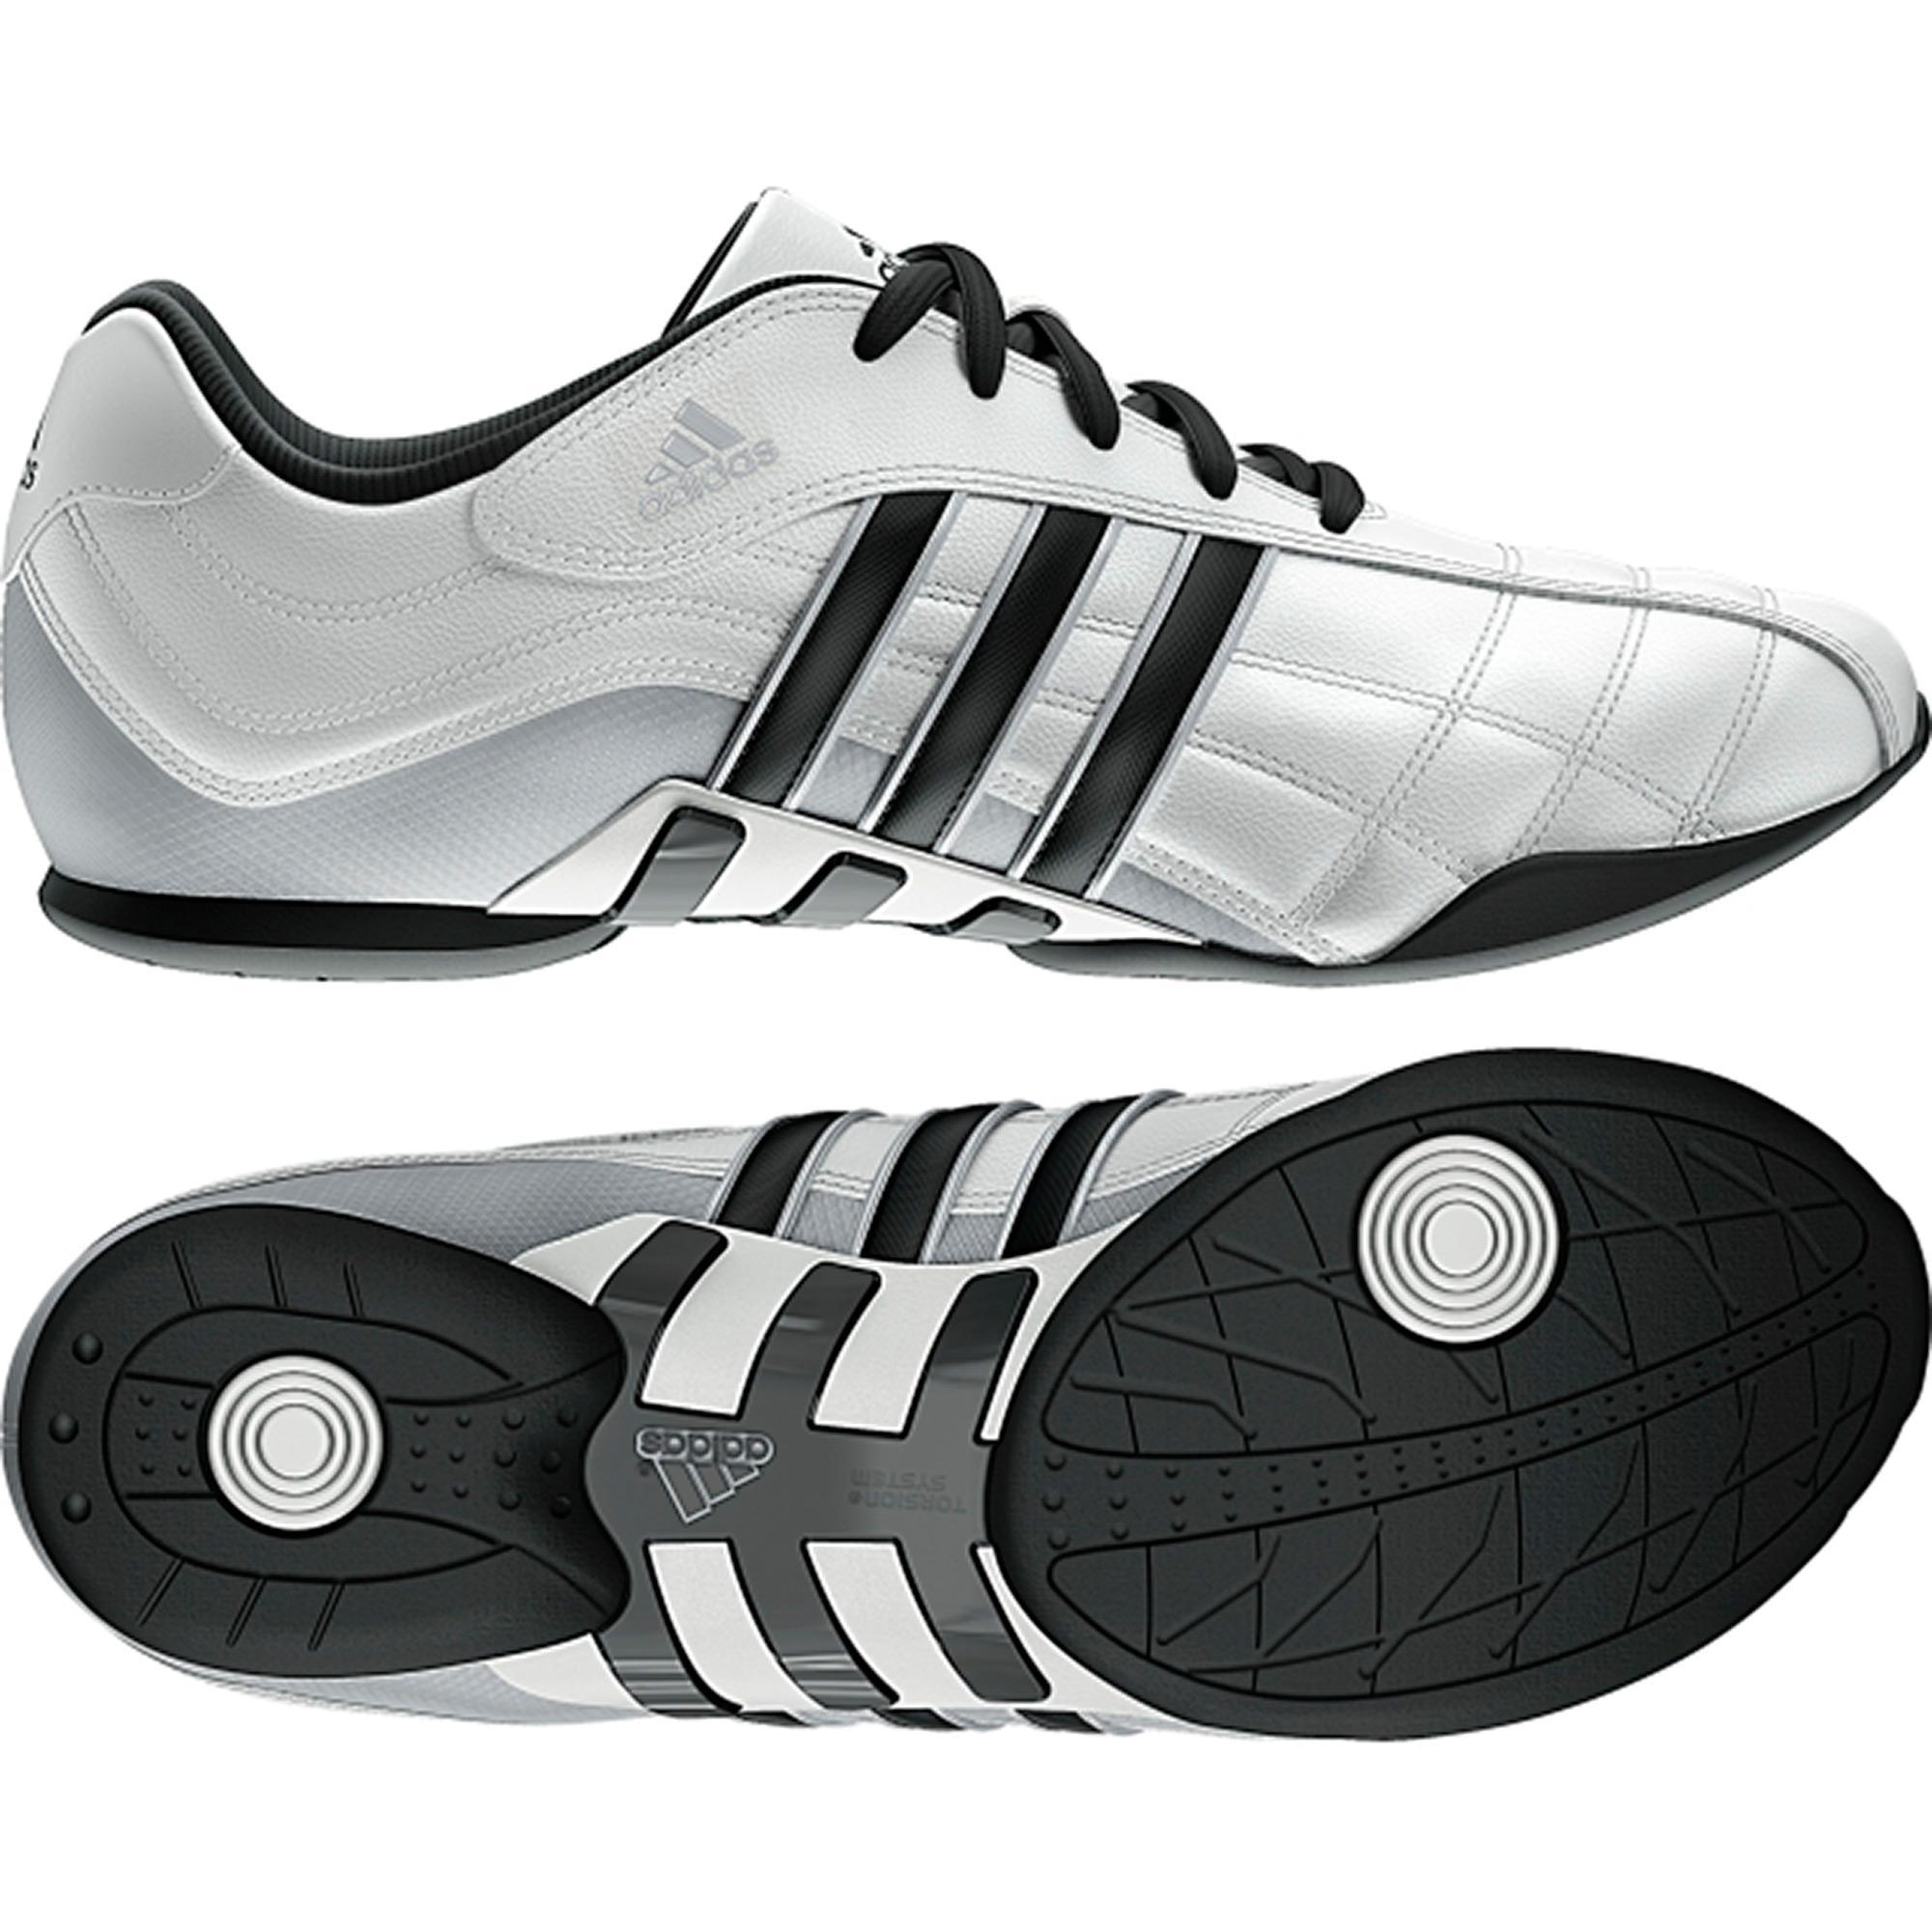 0fed43cd1f2 F32898 LSL B2CCat 3D sw 2000 sfrm jpg zapatillas adidas kundo